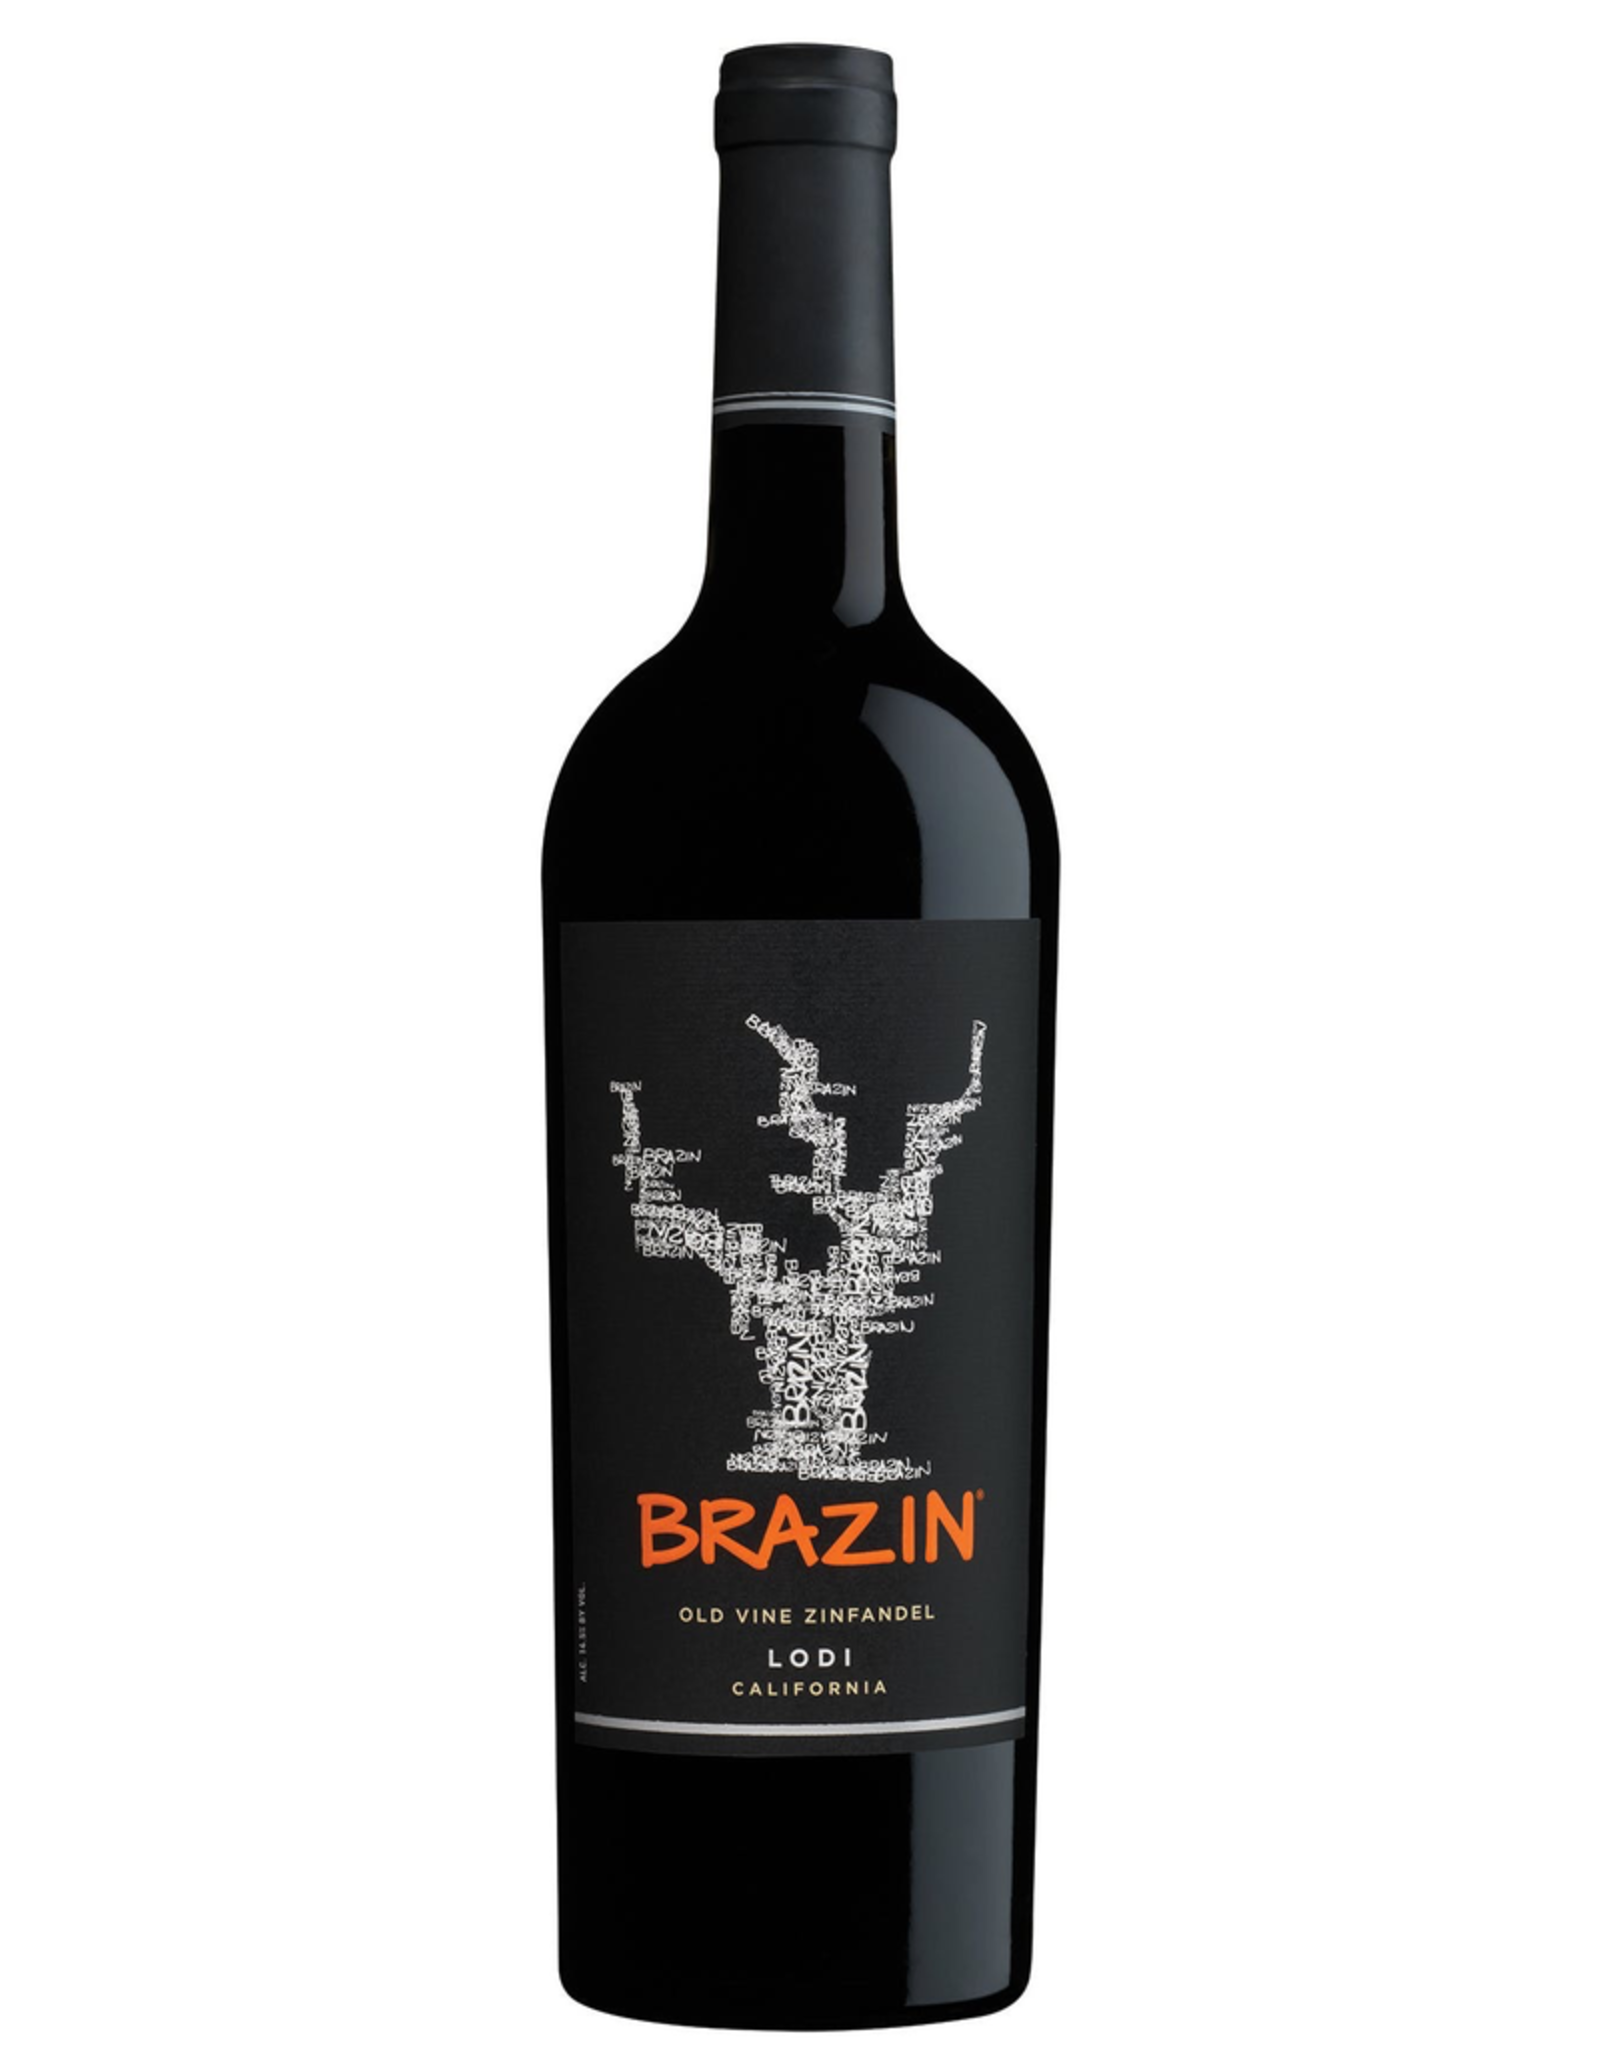 Red Wine 2017, BRAZIN, Old Vine Zinfandel, Lodi, Central Valley, California, 14.5% Alc, CTnr